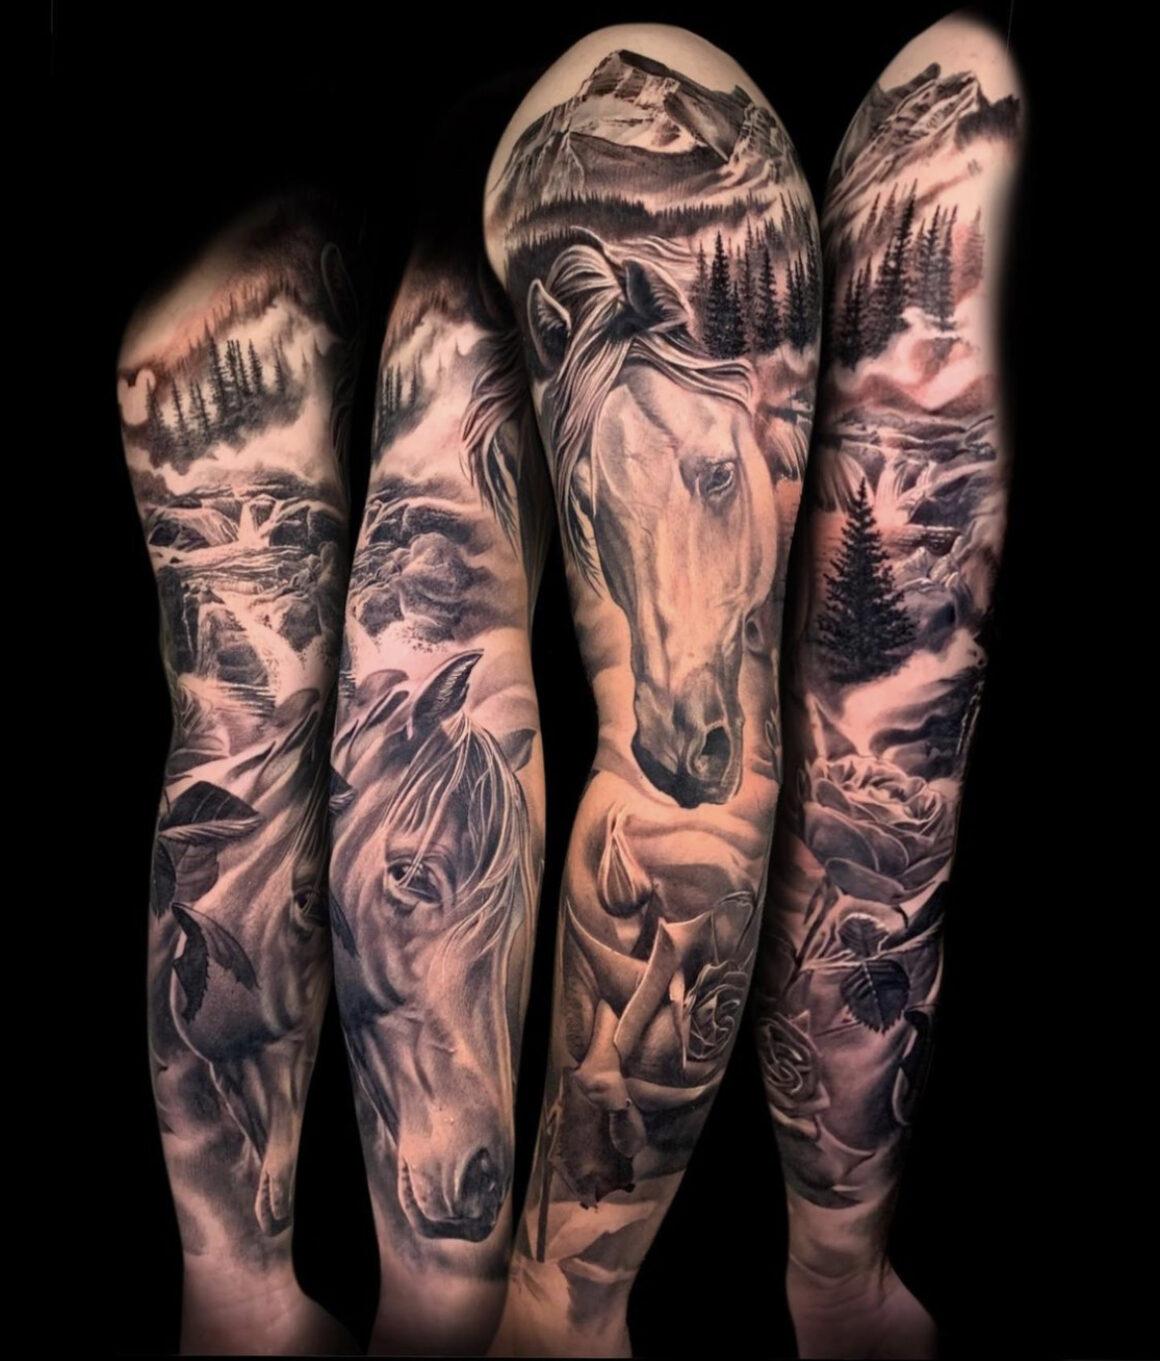 Jesse James, New World Samurai Tattoo Studio, Canmore, Canada